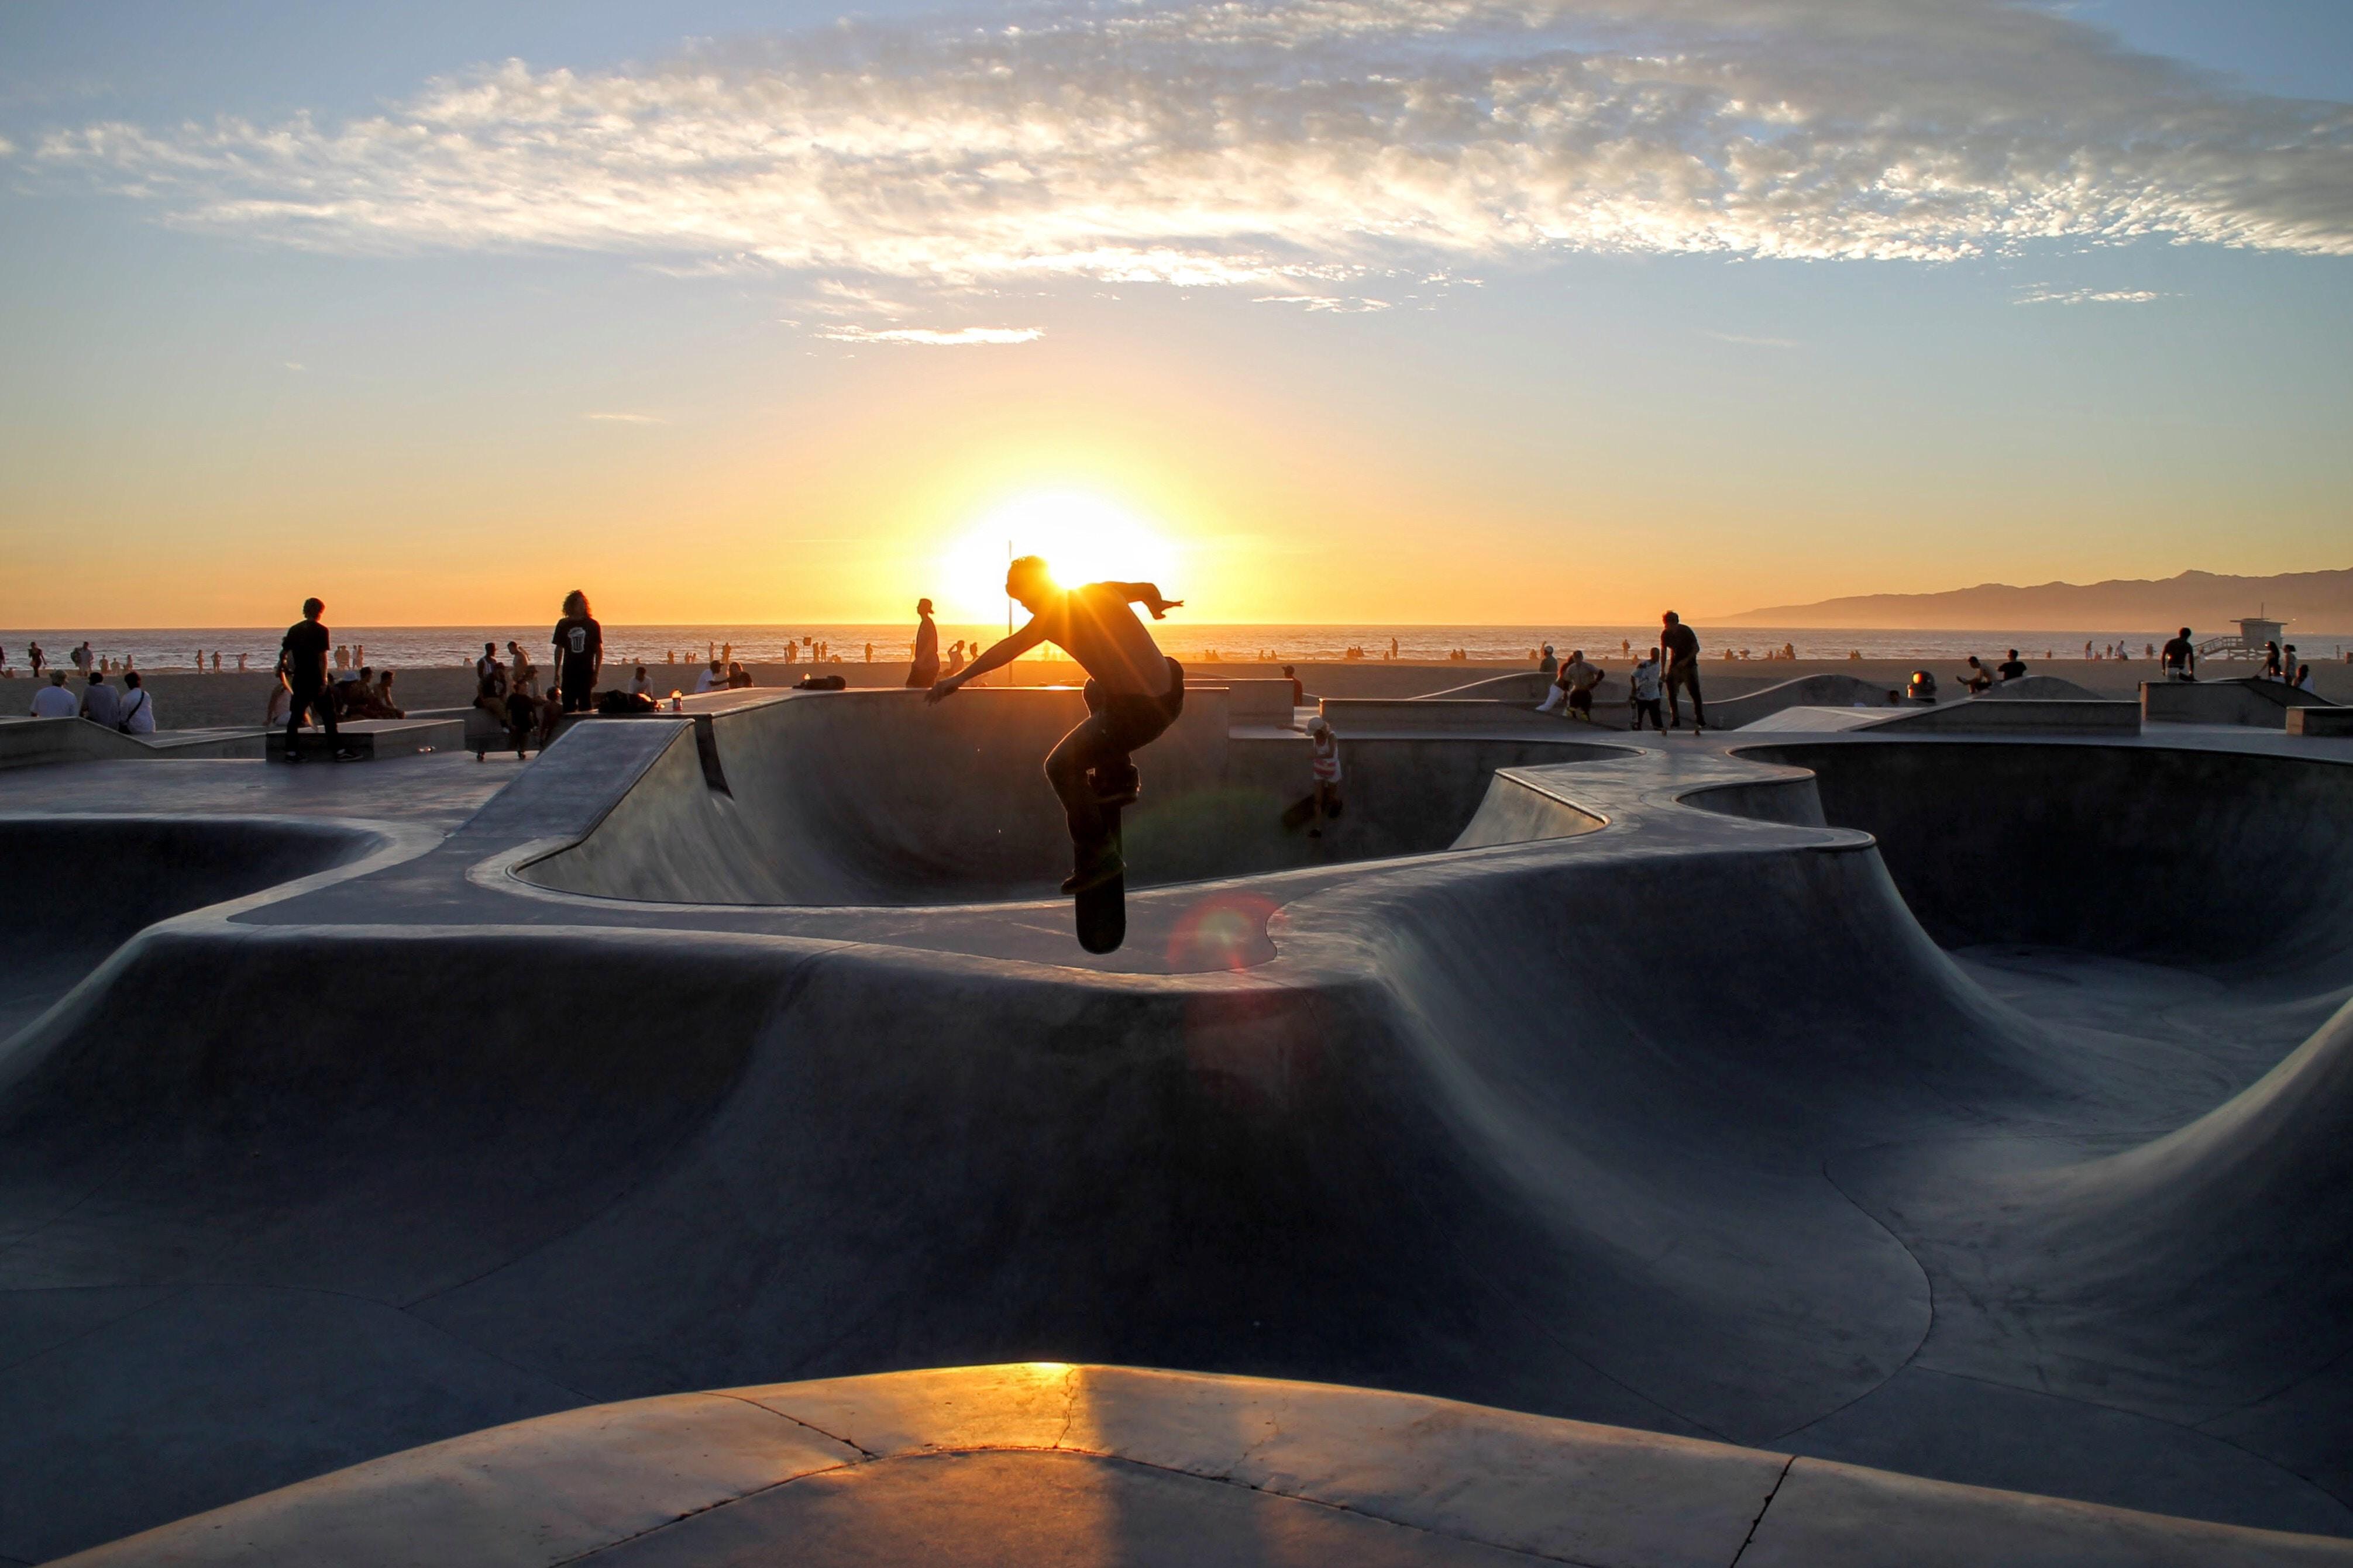 5403736 4022x2681 spin jump skaeboard cloud skateboarding 4022x2681